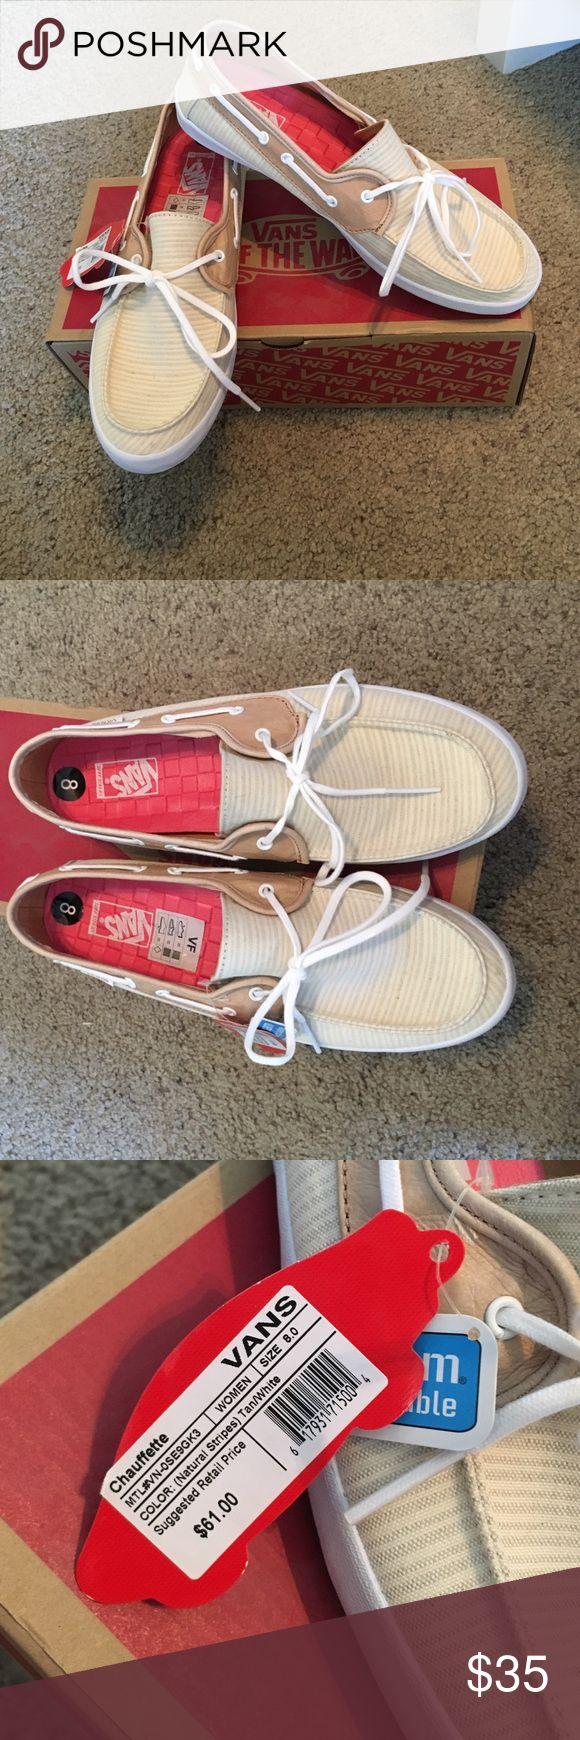 VANS boat shoes. Brand new, never worn, foam inserts. Vans Shoes Sneakers